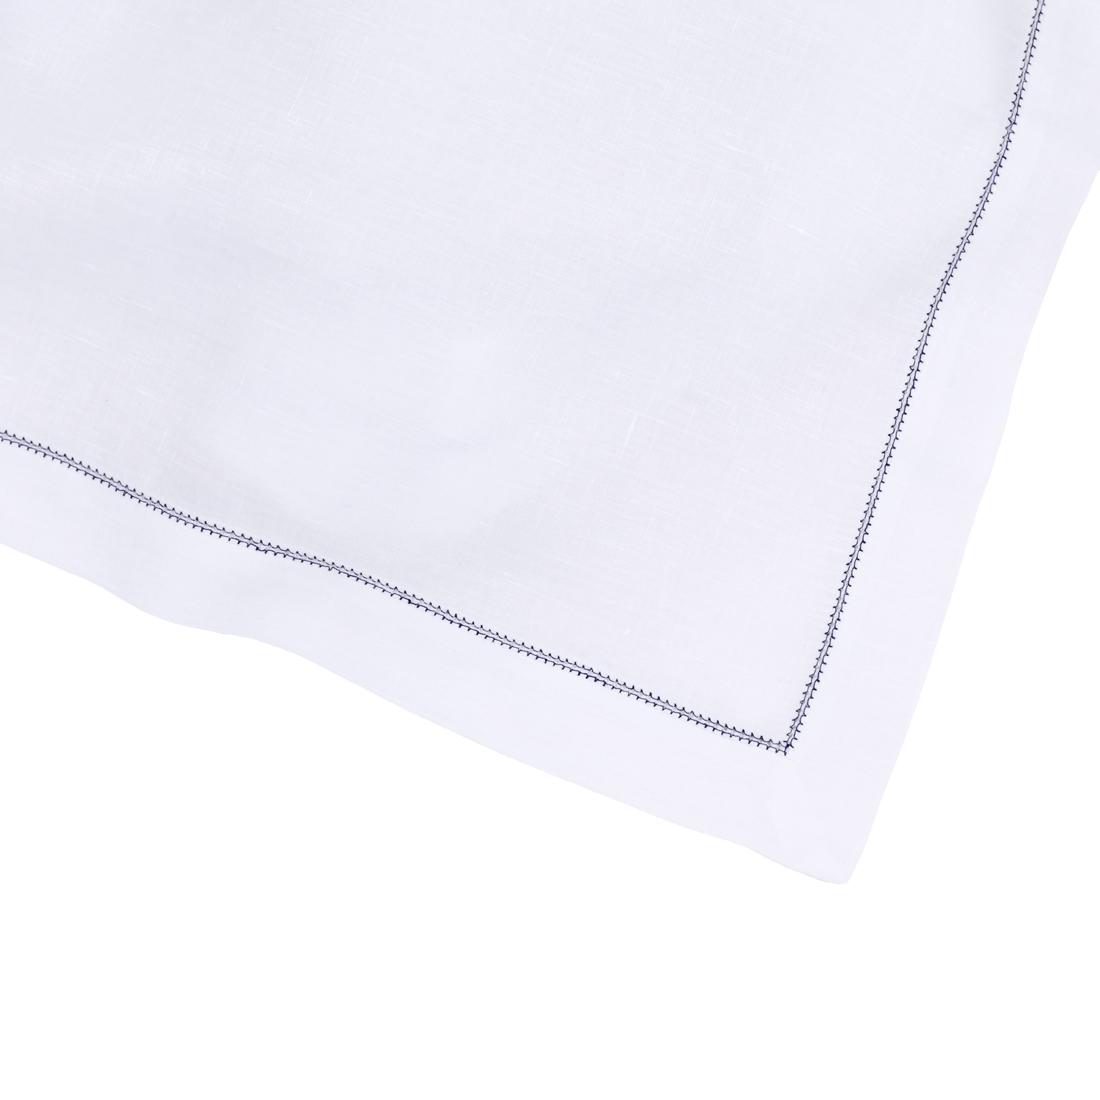 White Linen Napkin Navy Blue Contrast Hemstitch